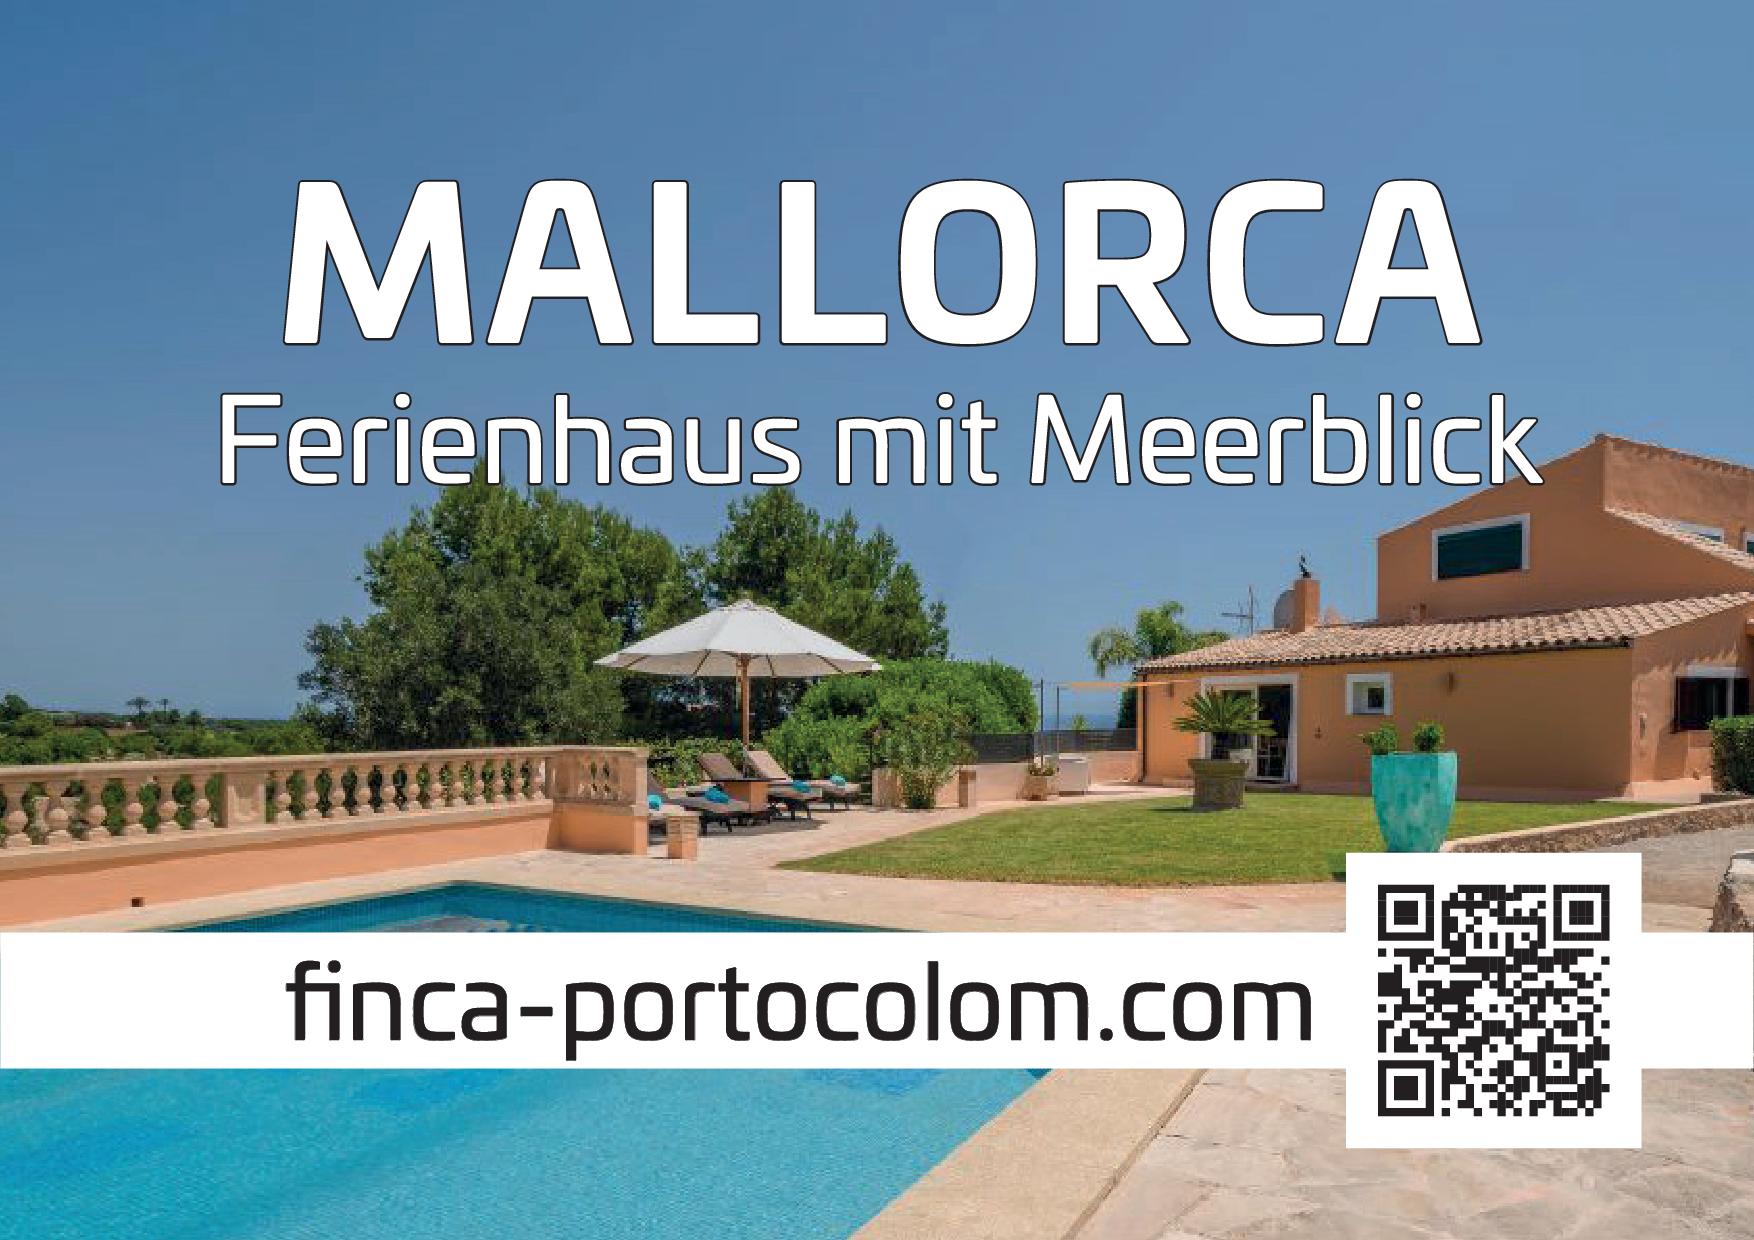 Ferienhaus / Finca mit Pool günstig mieten auf Mallorca